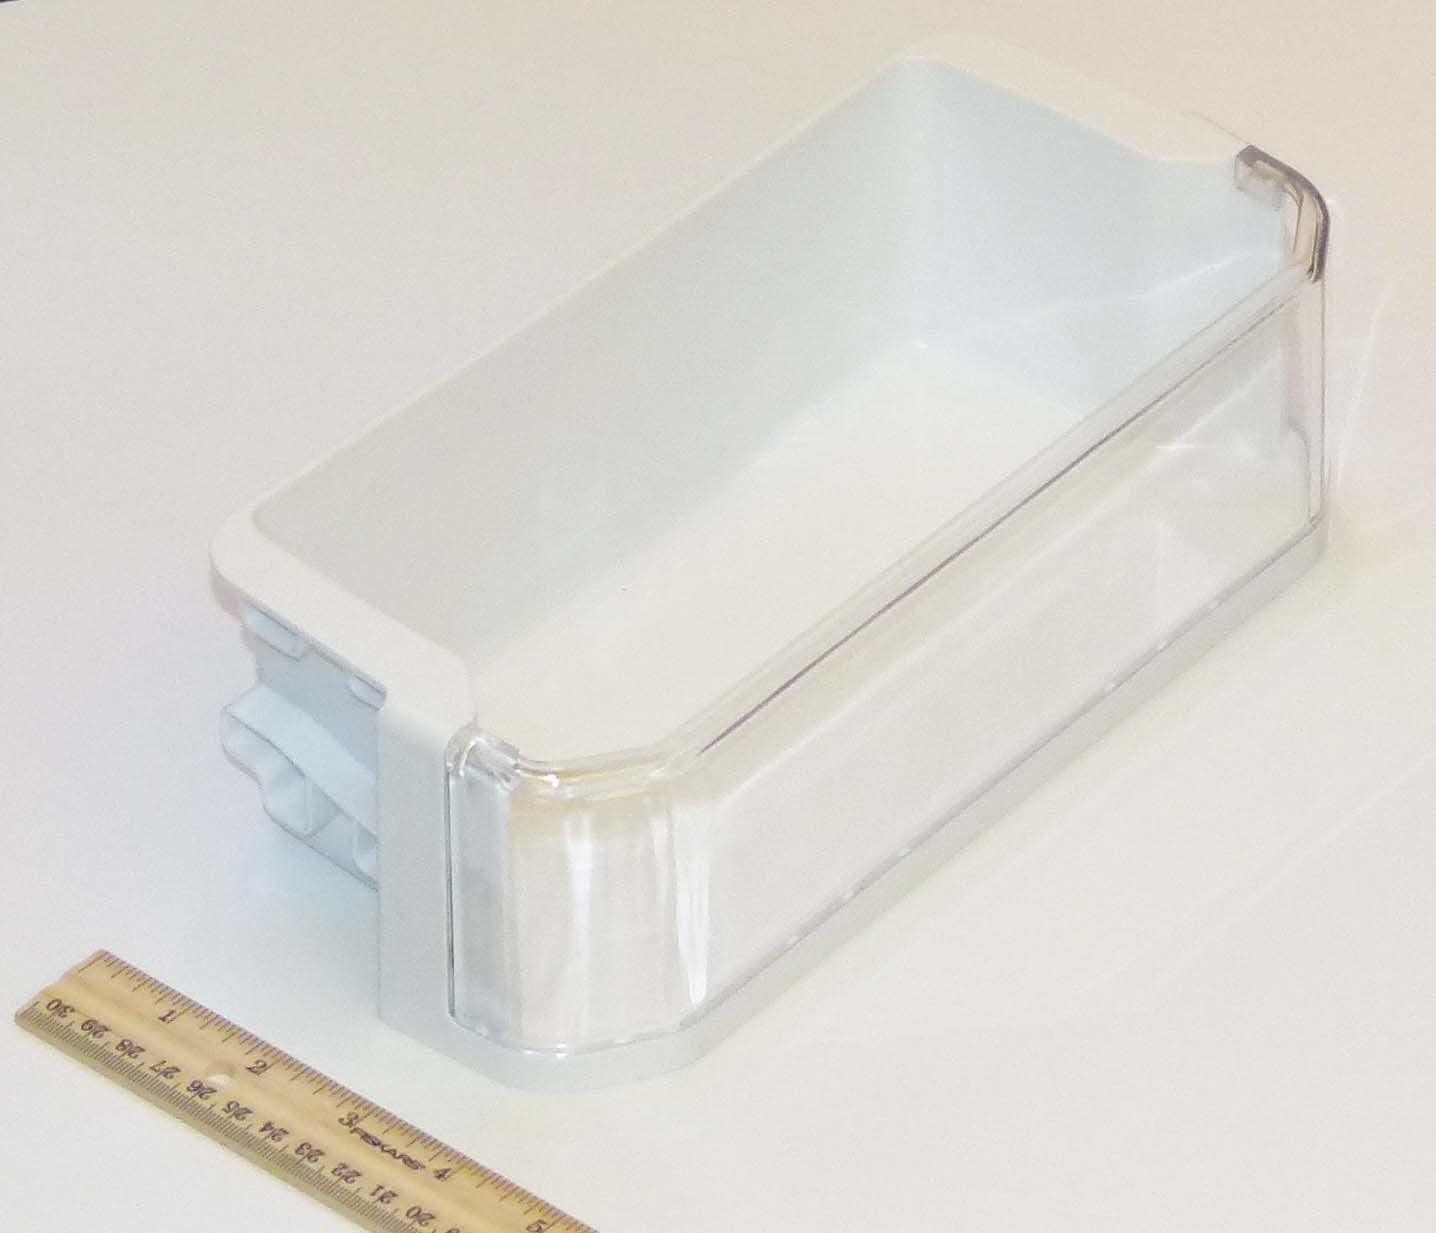 OEM LG Refrigerator Door Bin Basket Shelf Tray Assembly Originally Shipped With: LFC20770SB, LFC20770SB, LFC20770ST